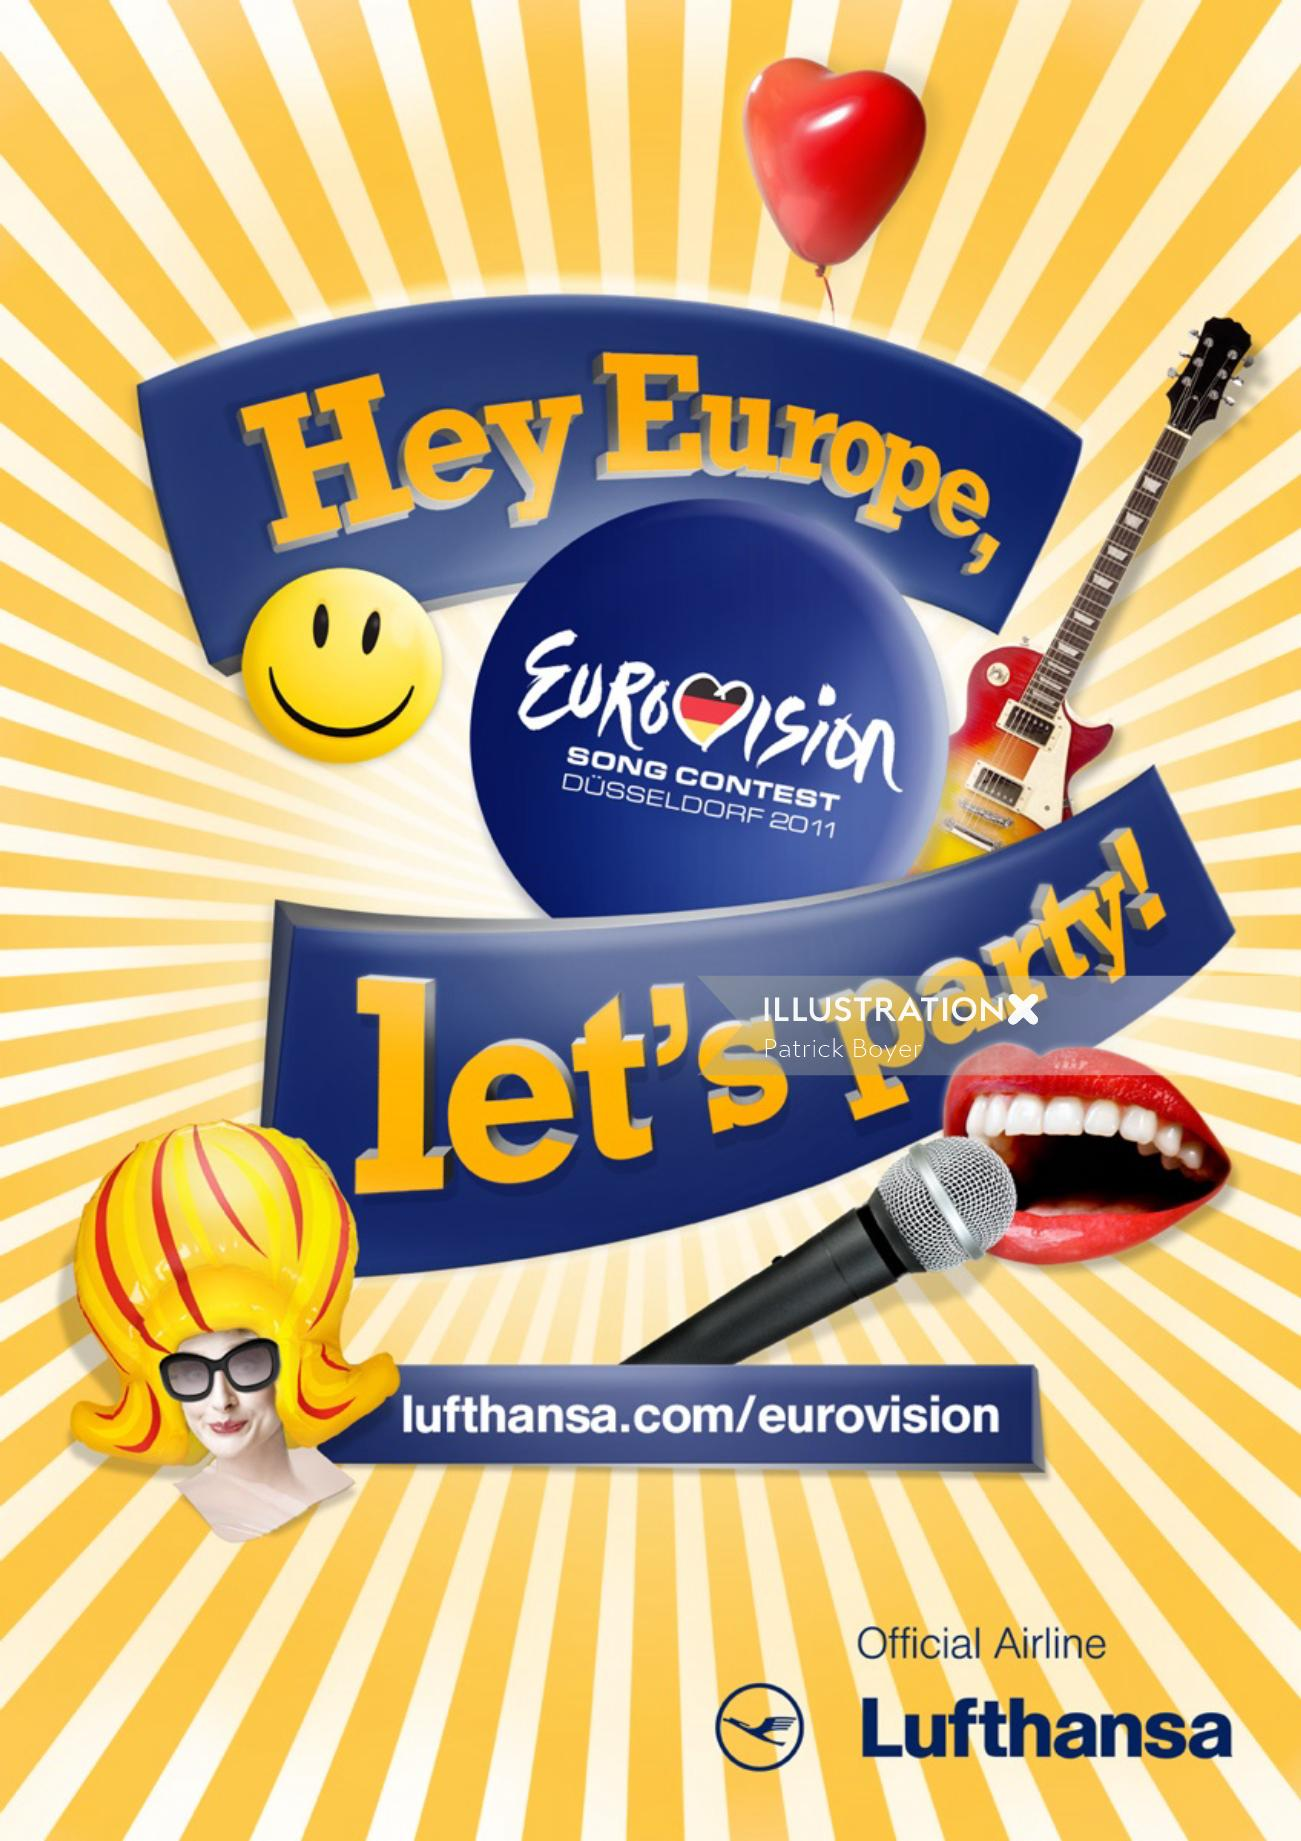 EuroVision 2011 - Lufthansa - An illustration by Patrick Boyer